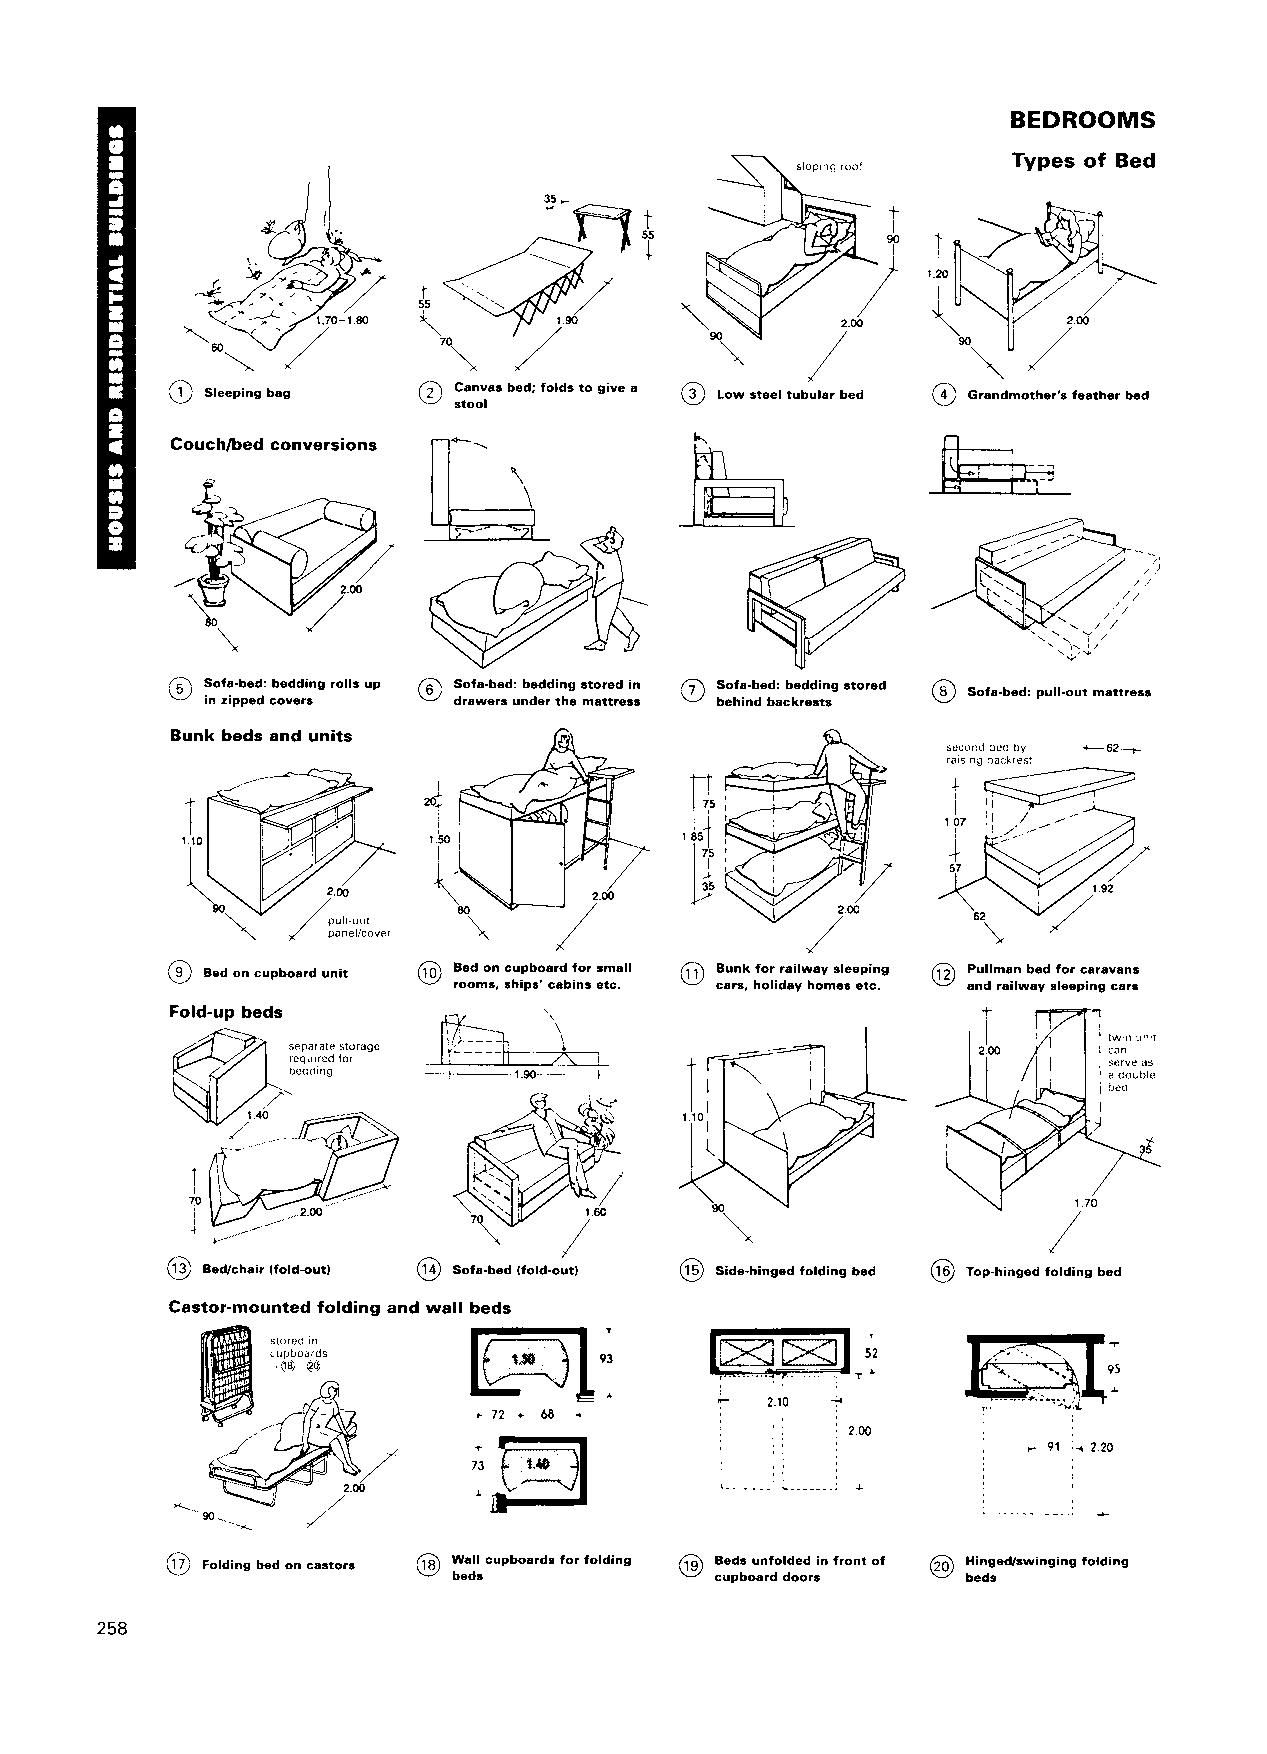 Neufert architects data ed 3 design pinterest - Interior design industry statistics ...